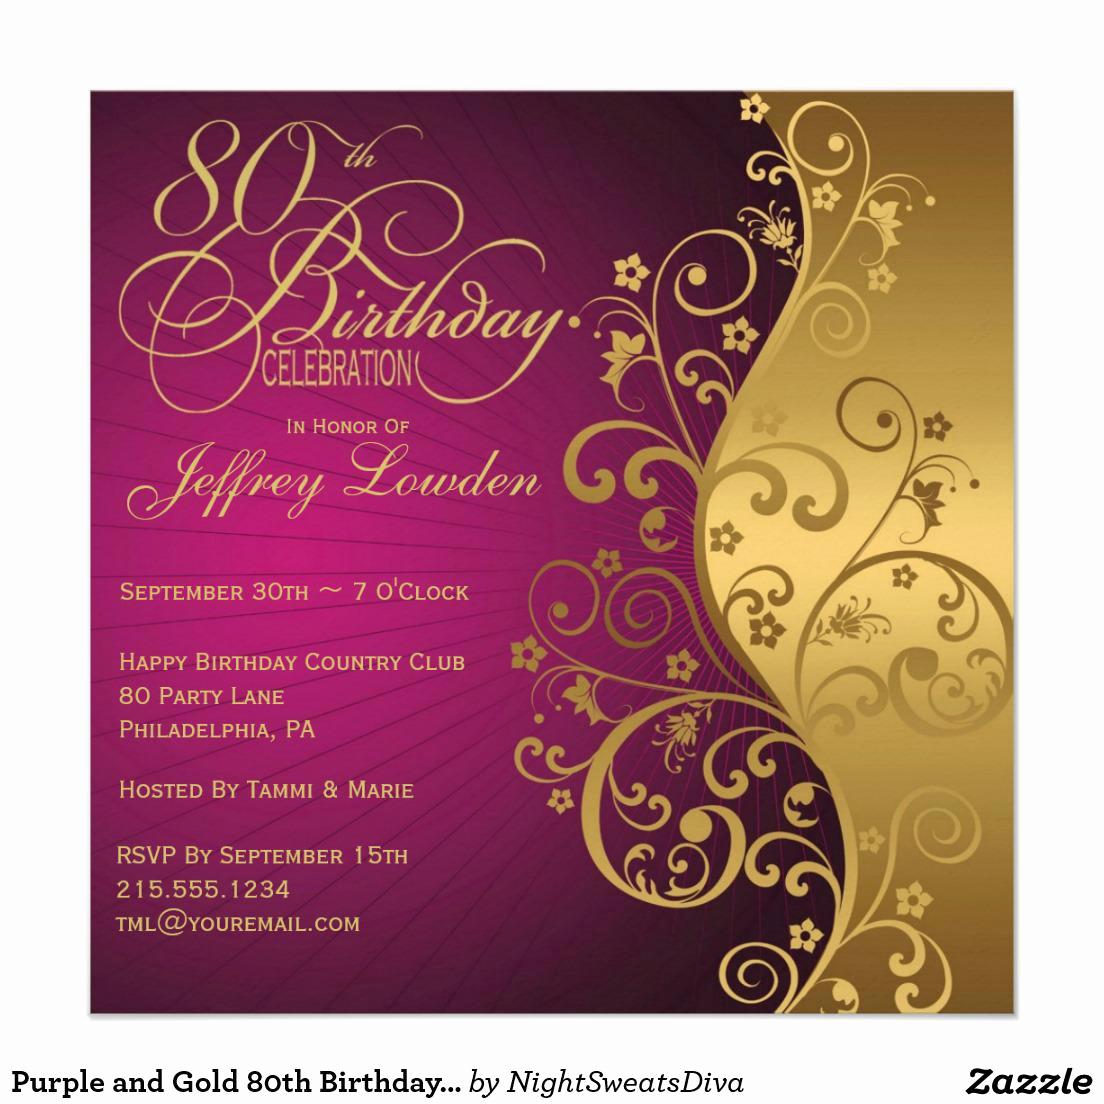 Birthday Party Invitation Template New 15 Sample 80th Birthday Invitations Templates Ideas